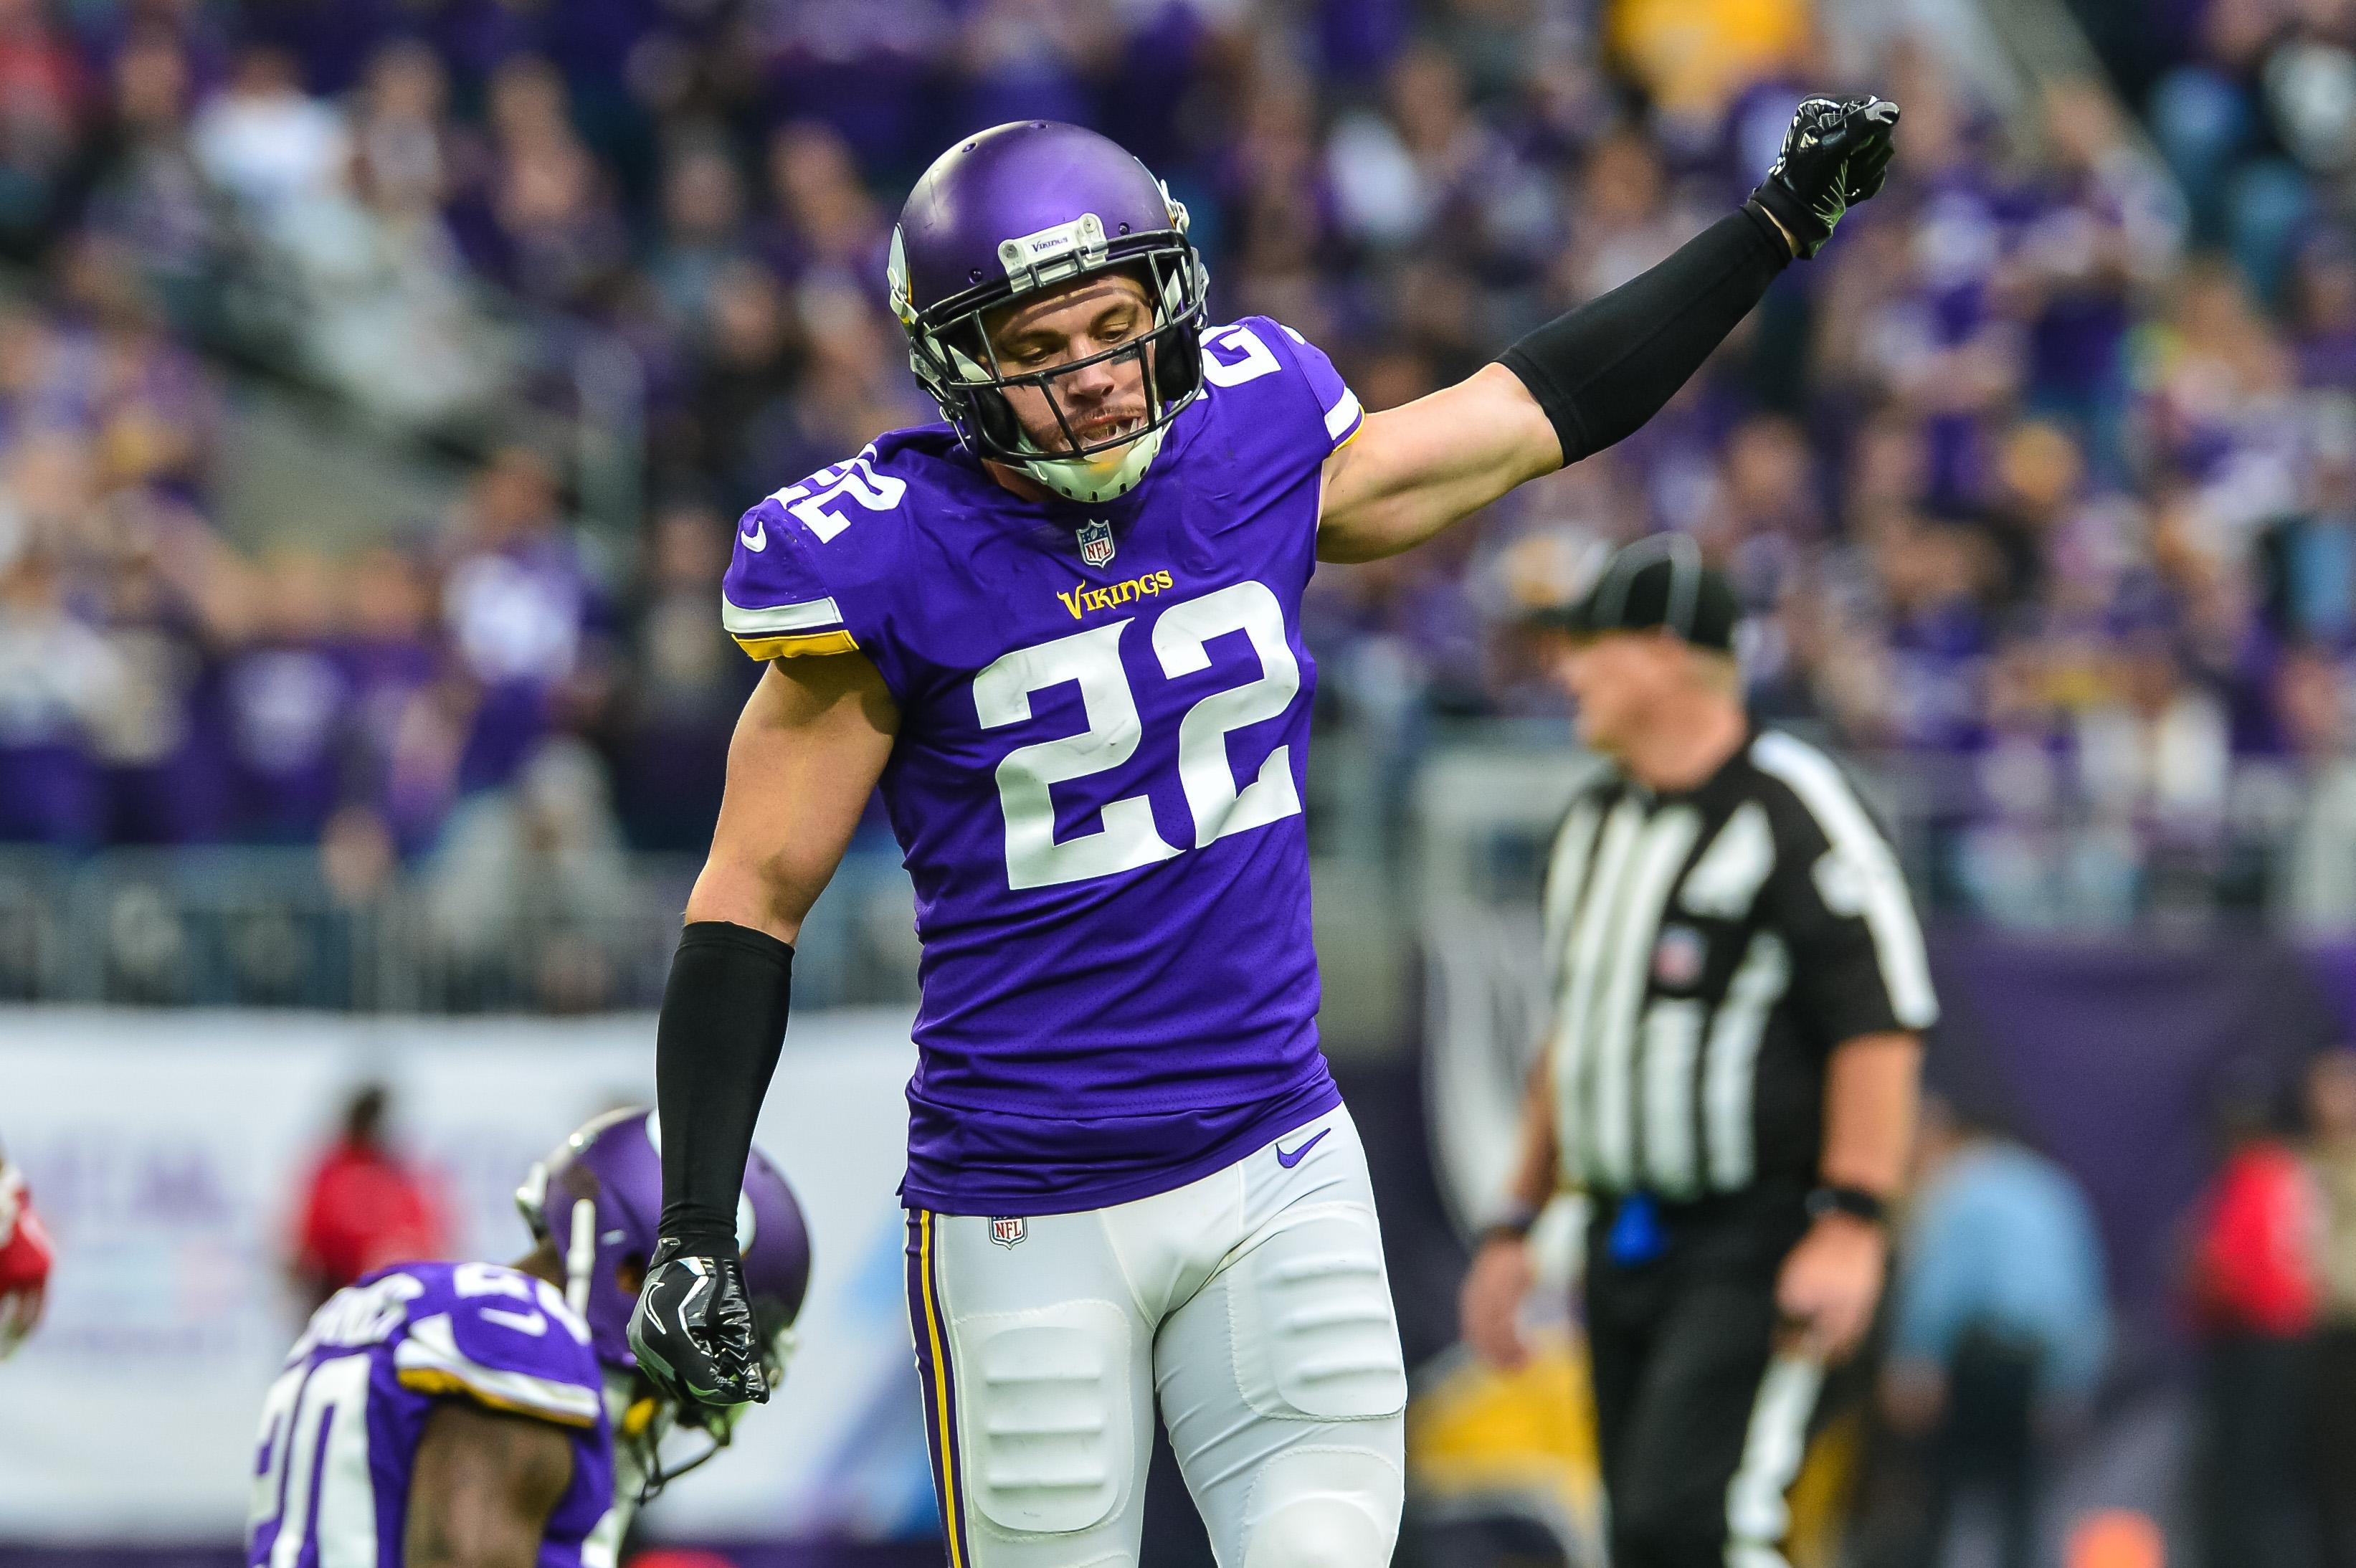 fd852725a Daily Norseman Archives - Minnesota Vikings 2018 Season - Page 8